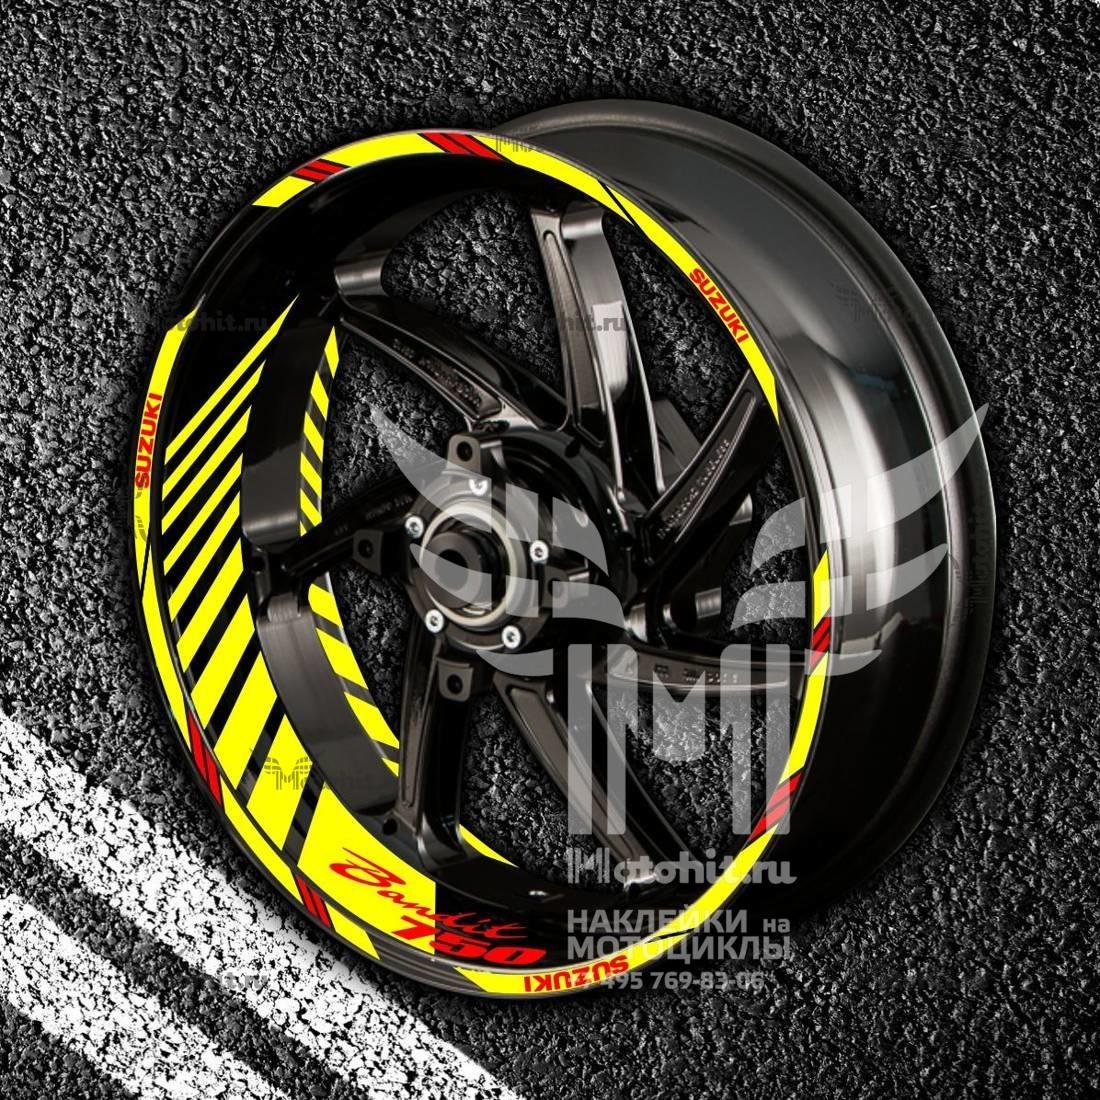 Комплект наклеек с полосами на колеса мотоцикла SUZUKI bandit-750